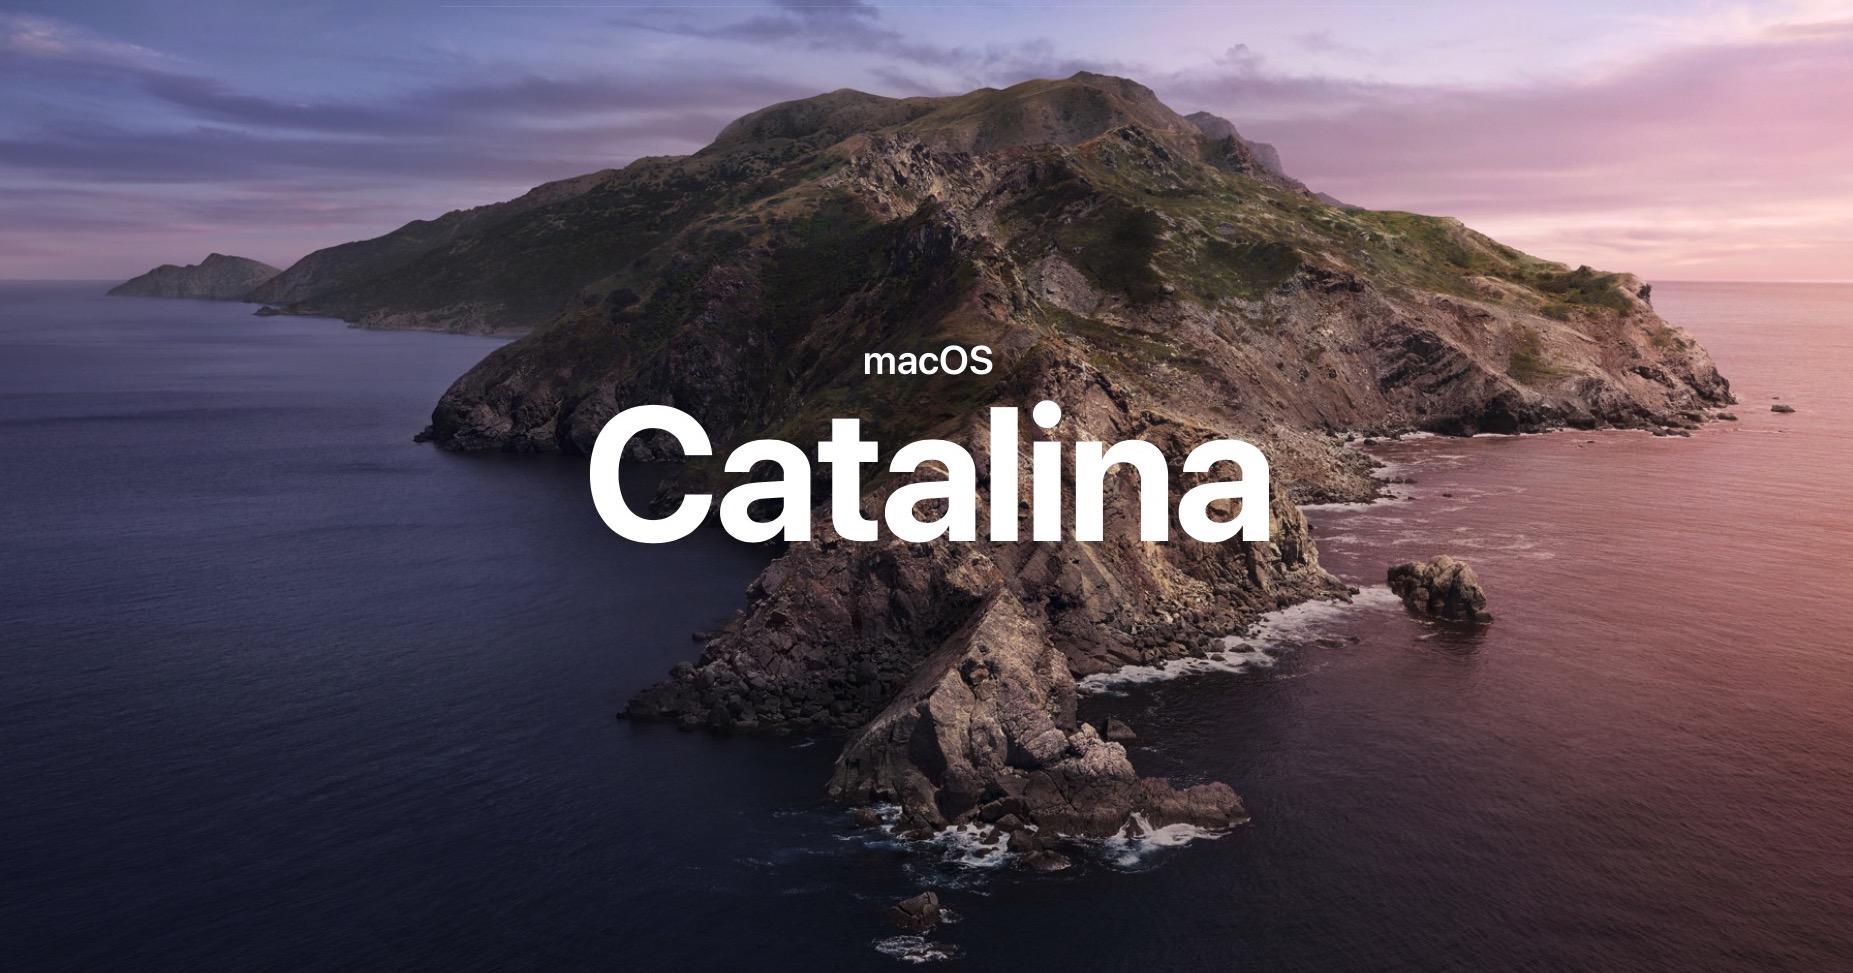 image of mac os catalina 10.15